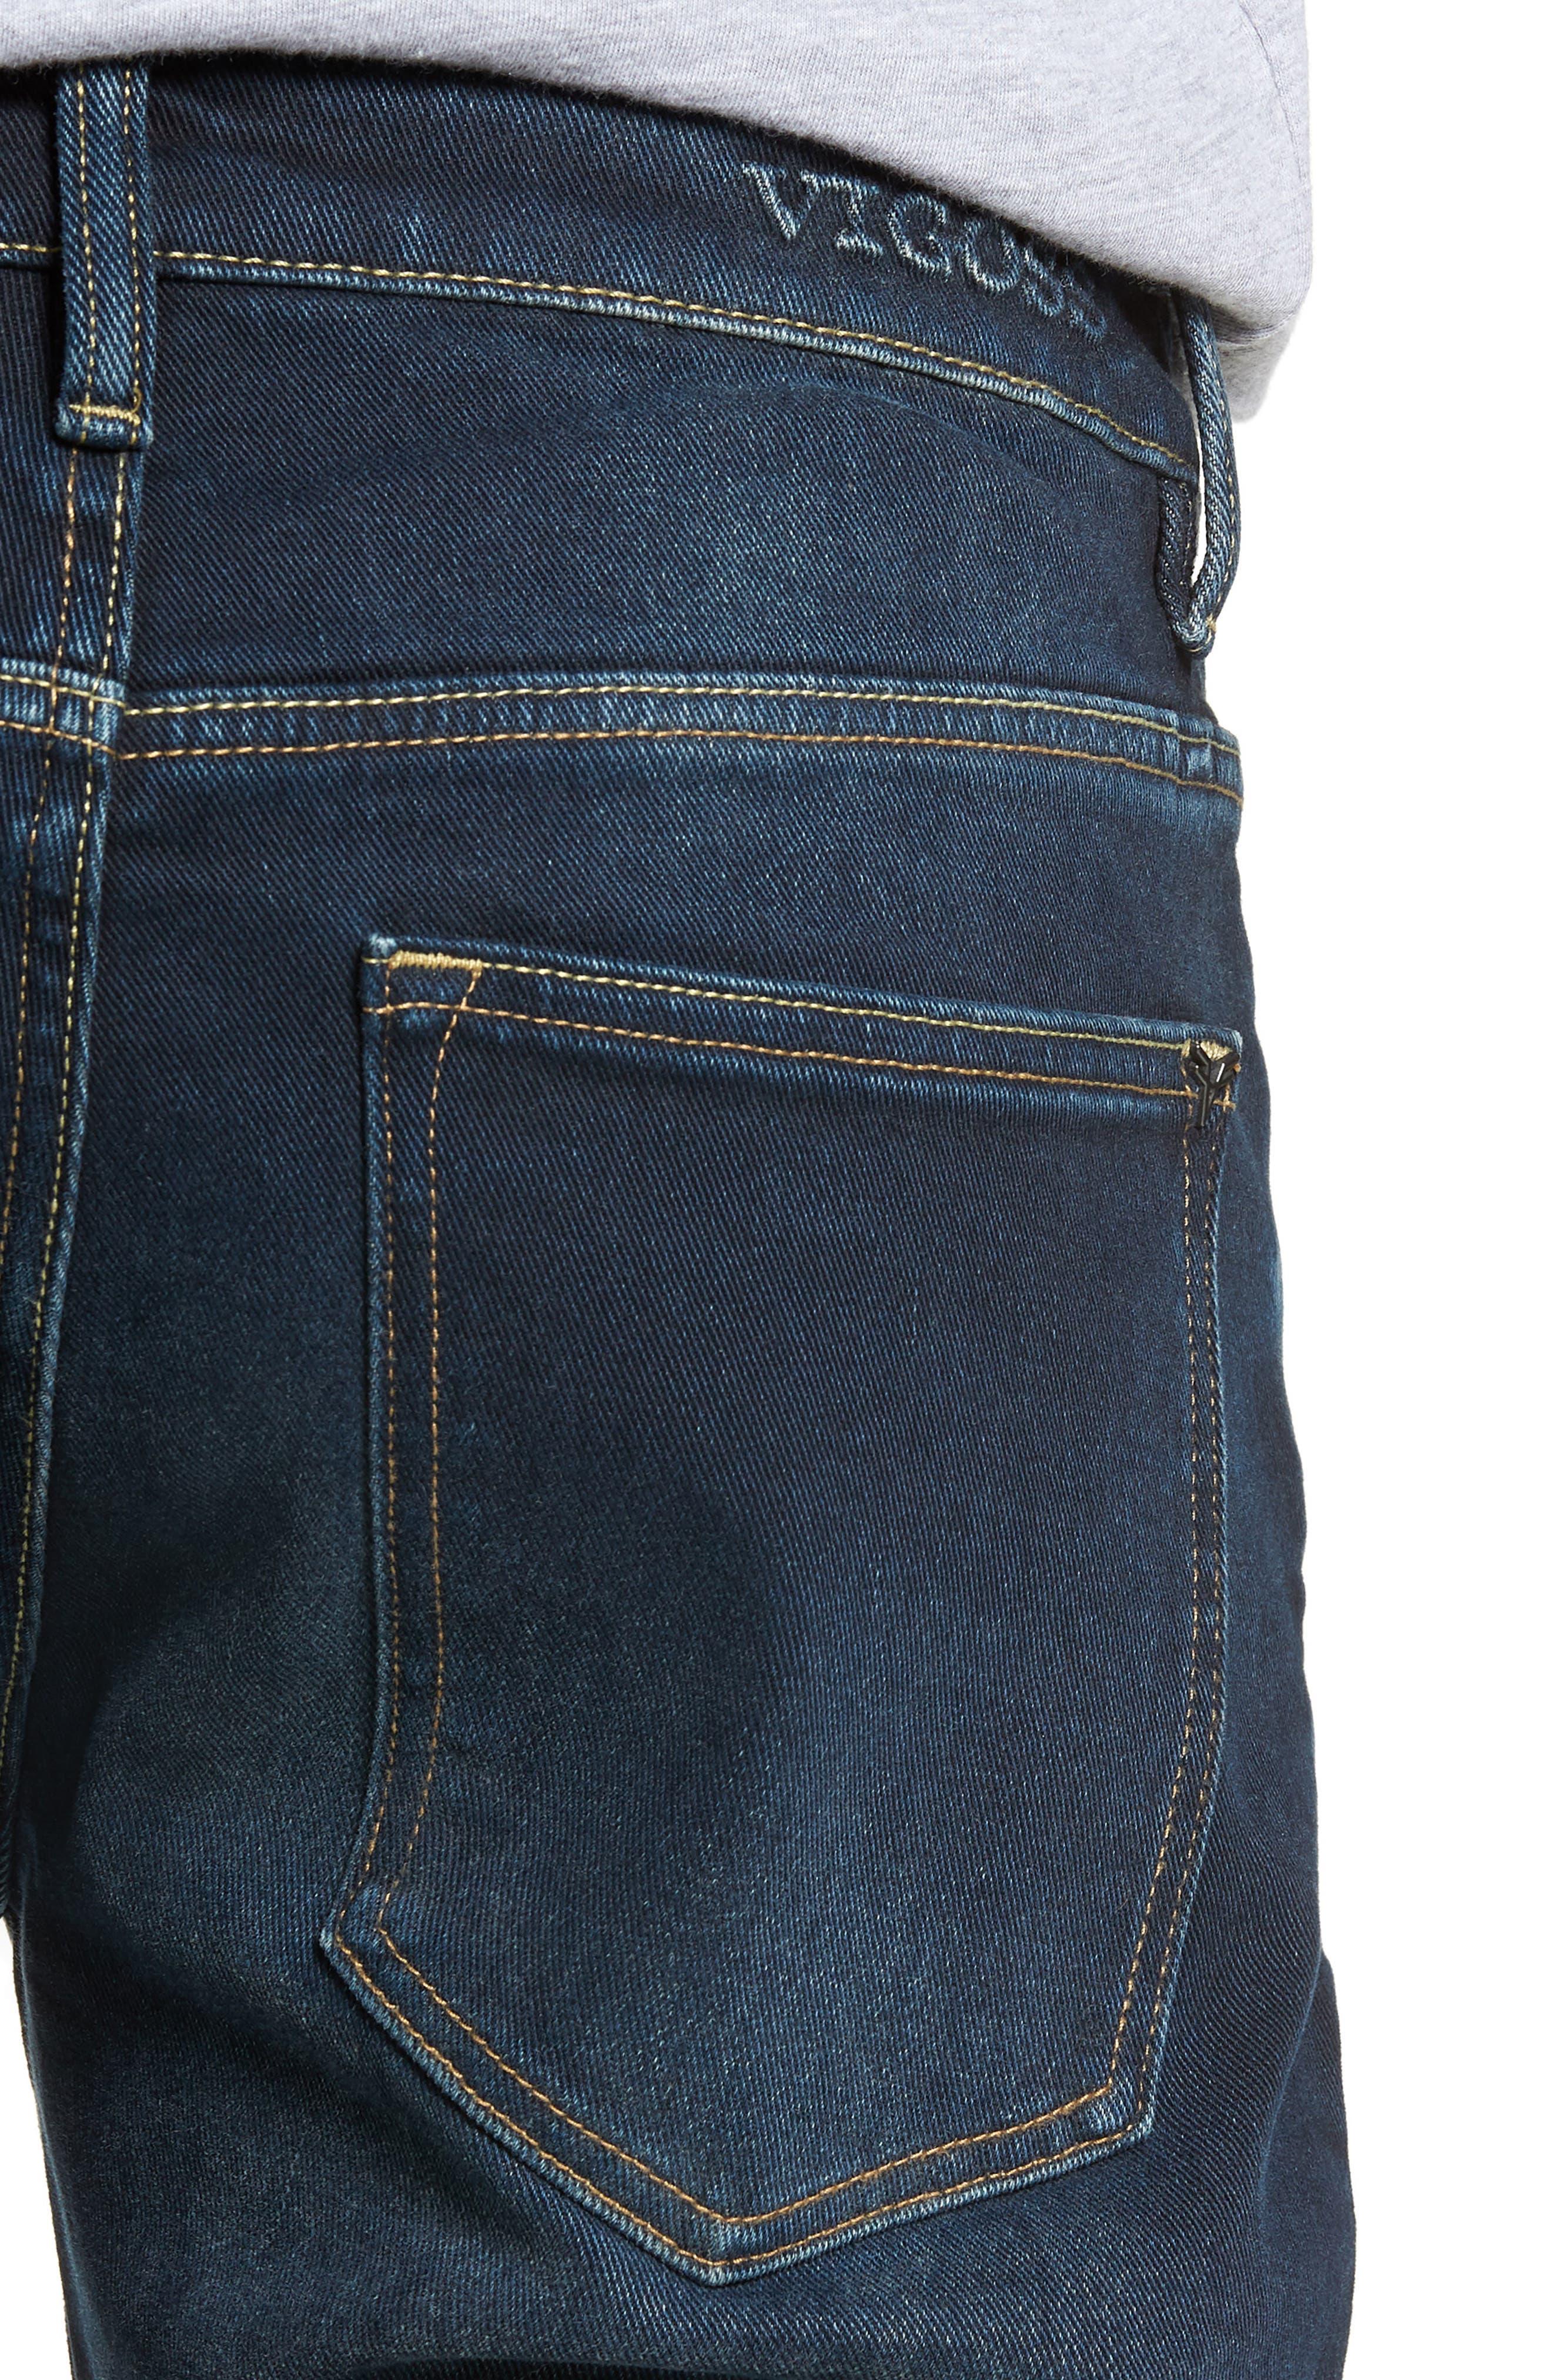 Jude Slim Fit Jeans,                             Alternate thumbnail 4, color,                             403